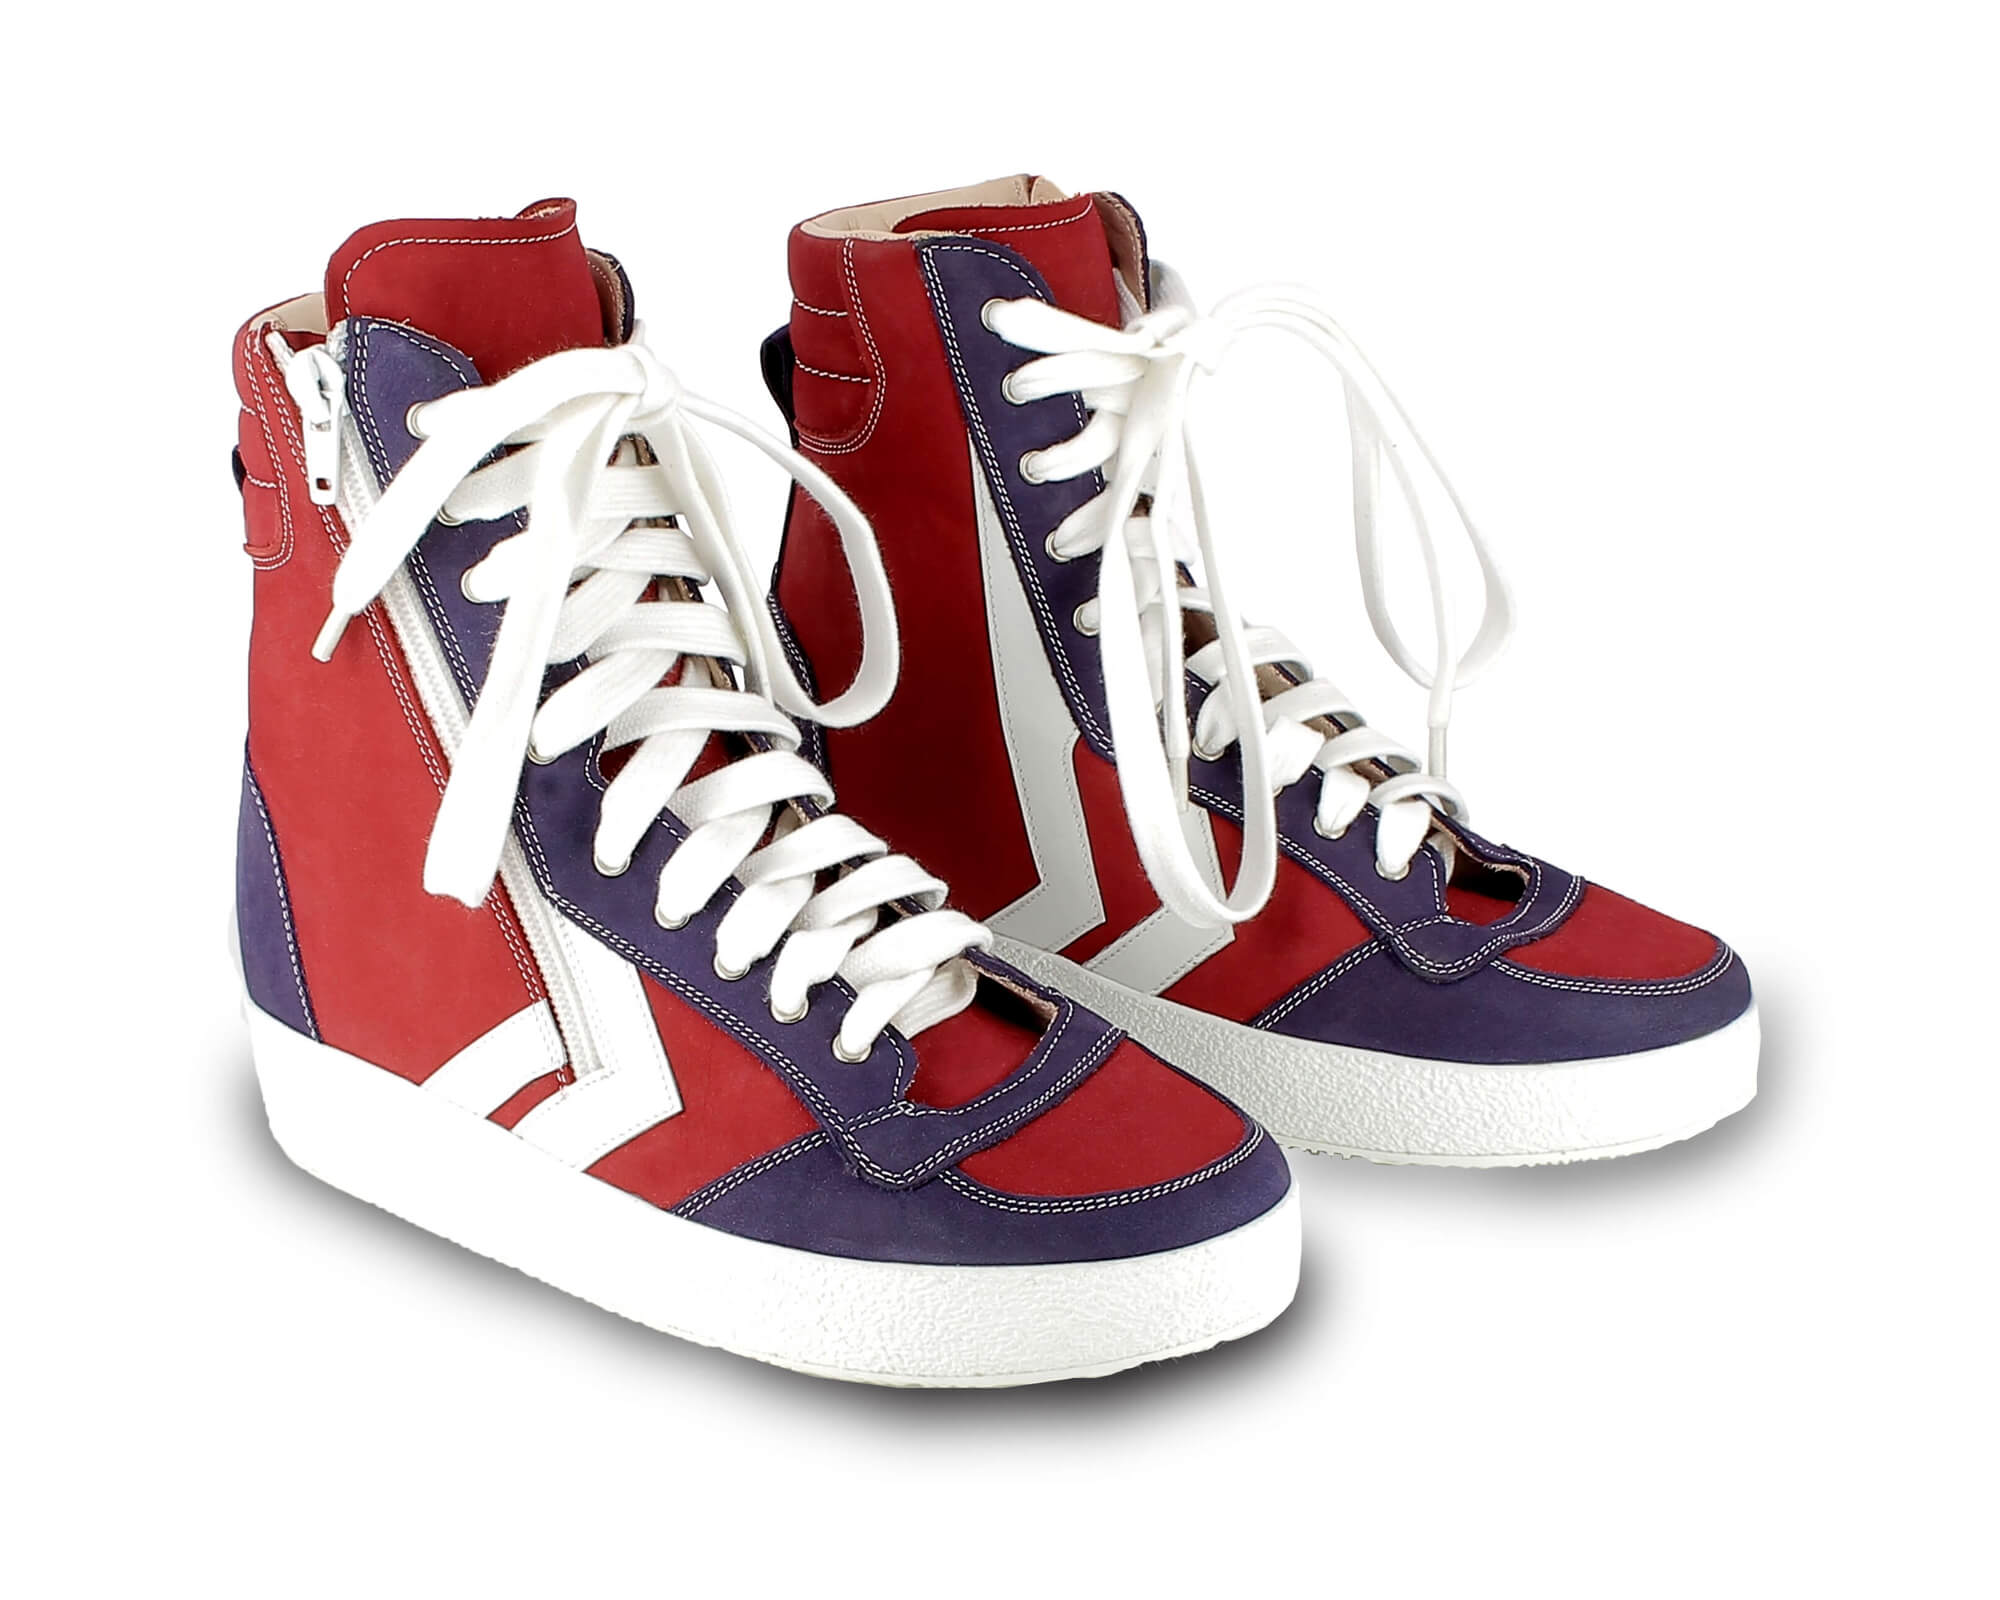 Orthopädischer-Maßschuh-Sneaker-Rot-Blau-Weiß-hoch